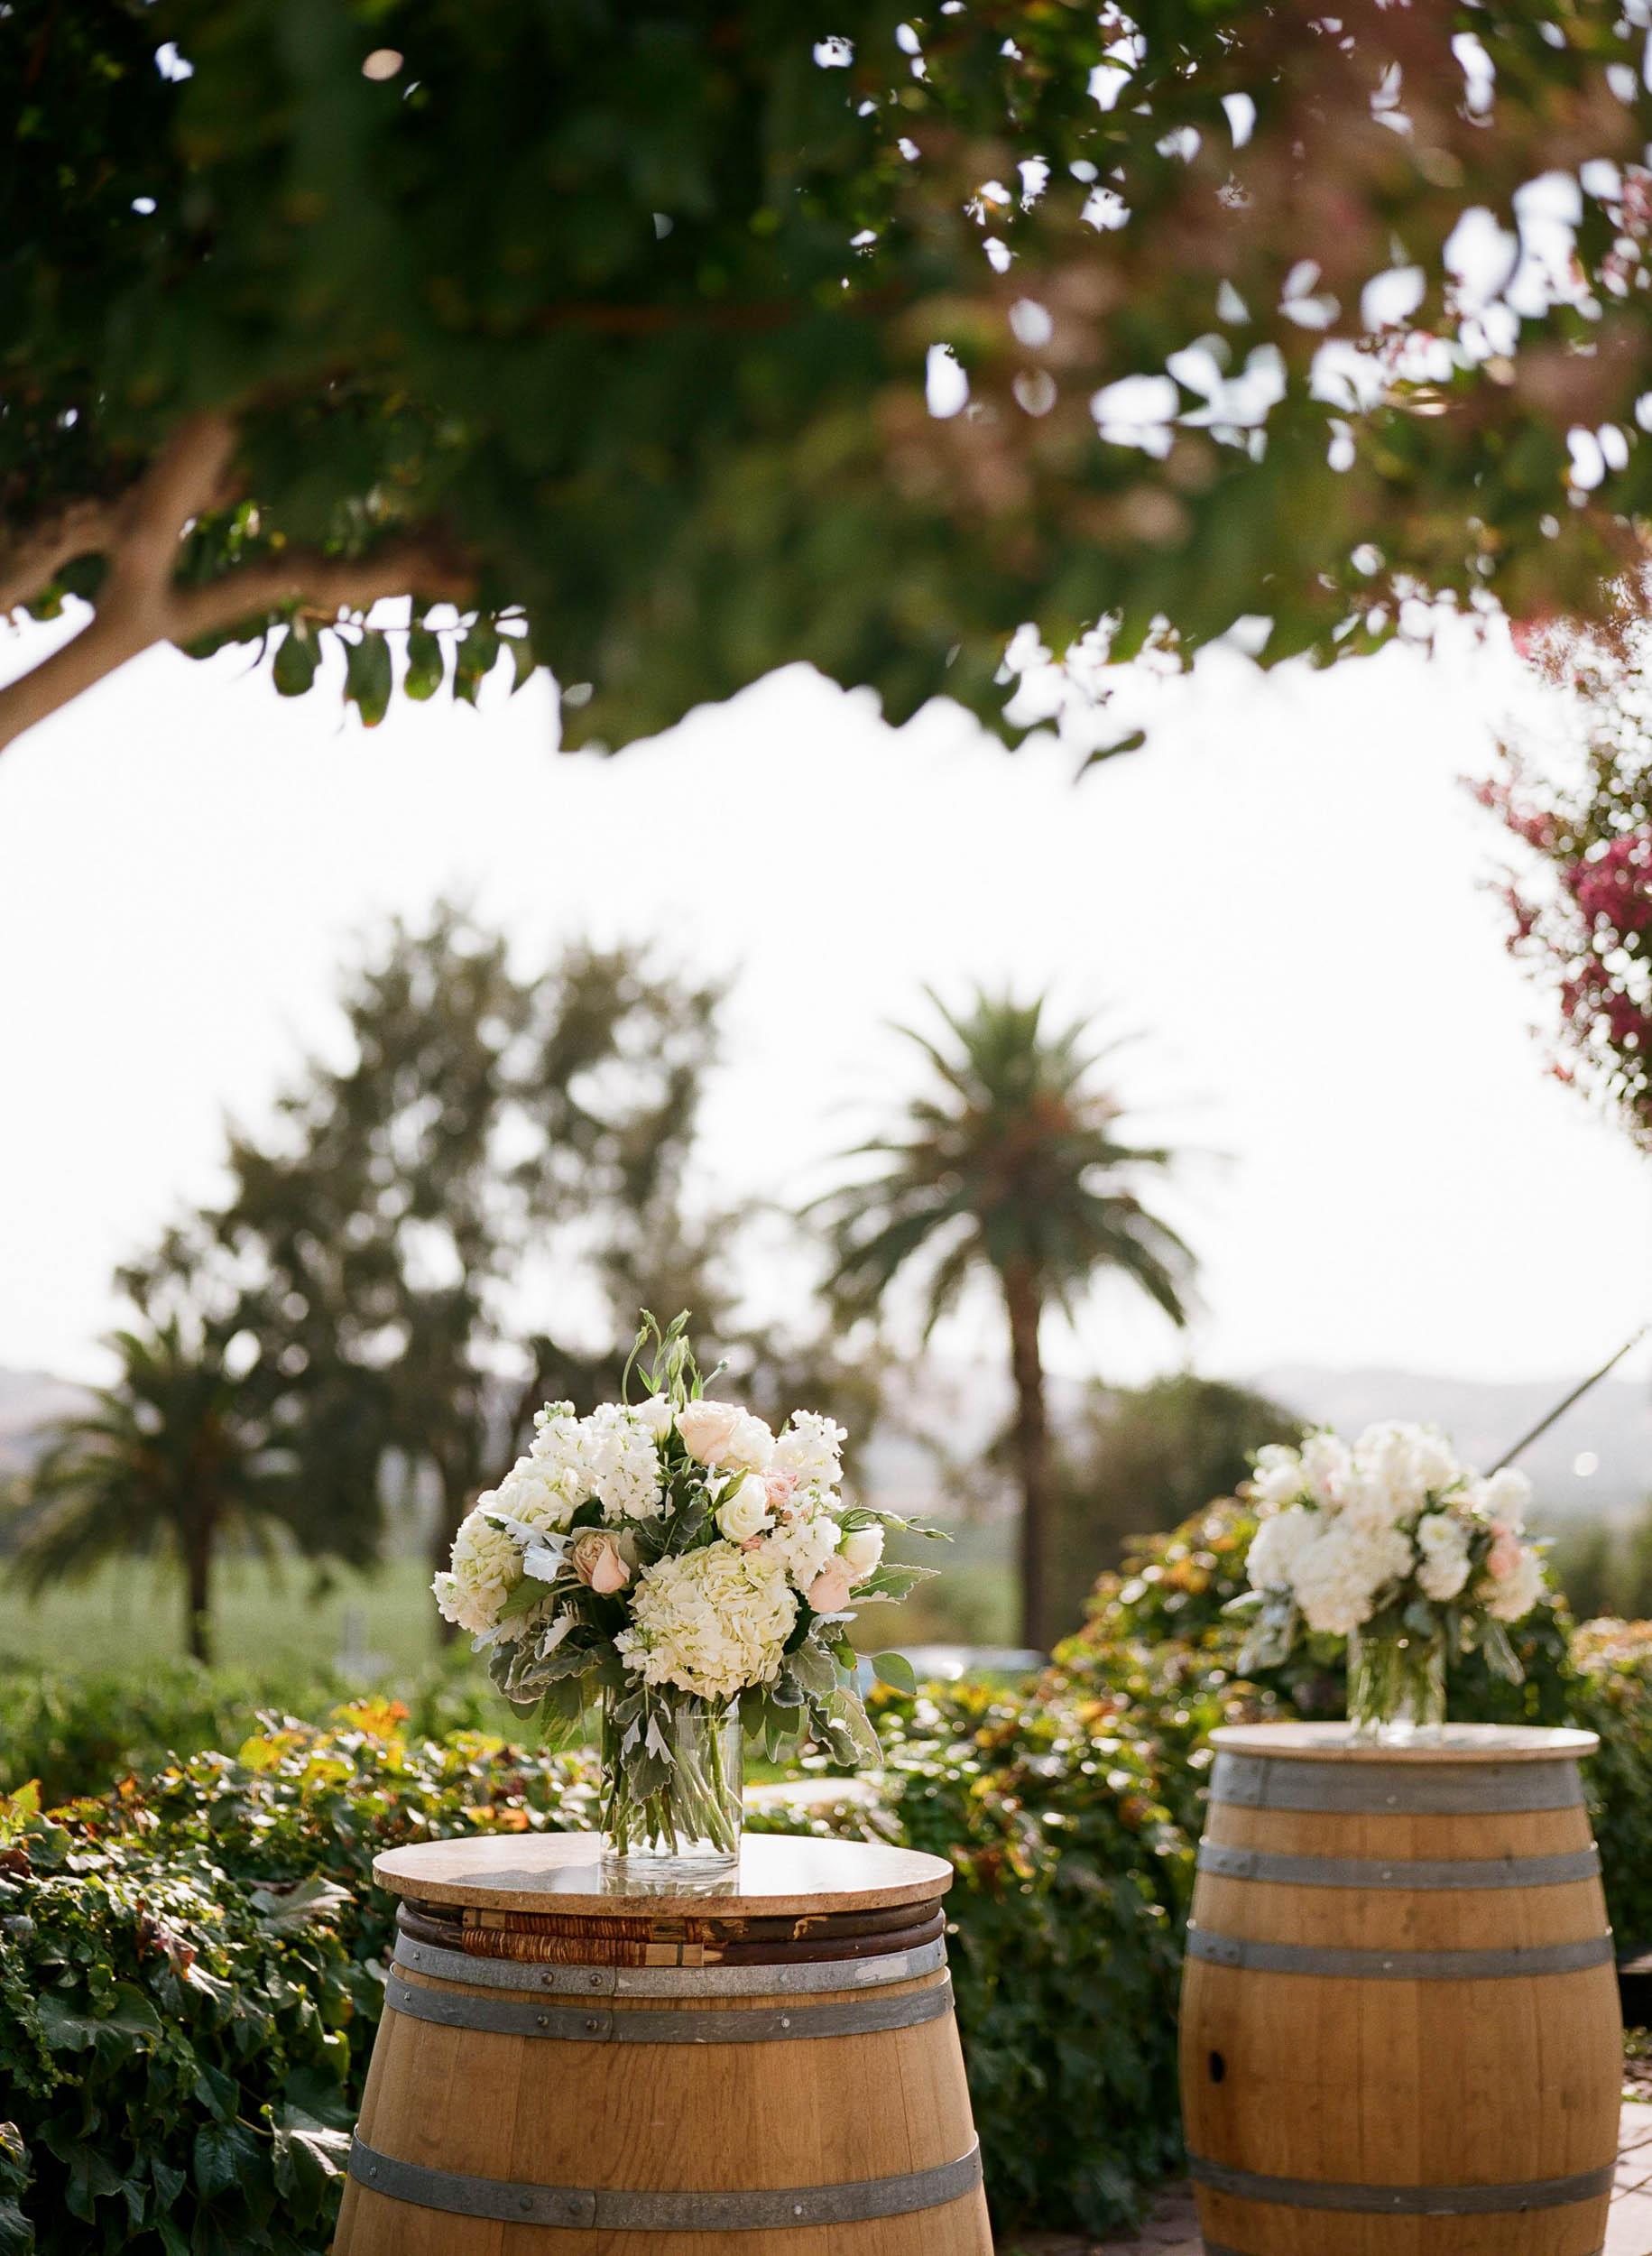 Las Positas Wedding_Buena Lane Photography_000092050008.jpg